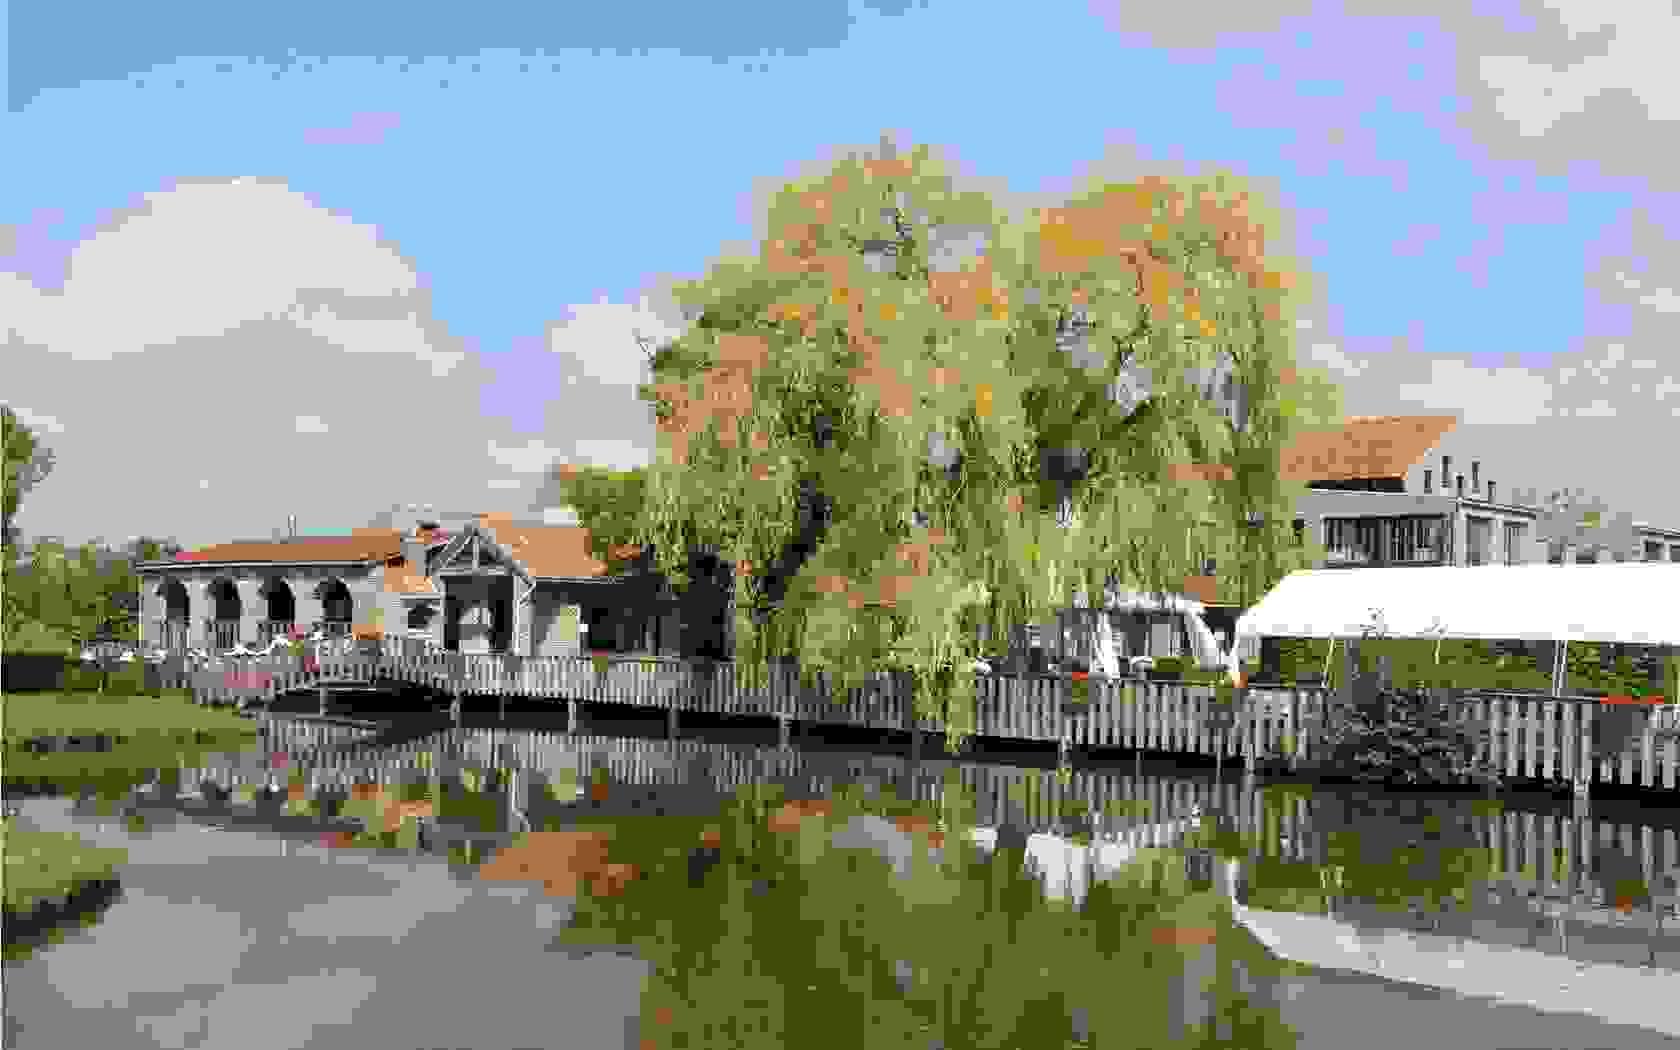 productvoorstelling Stevoort - Een mooie locatie voor een productvoorstelling op een boogscheut van Stevoort - De Waterhoek